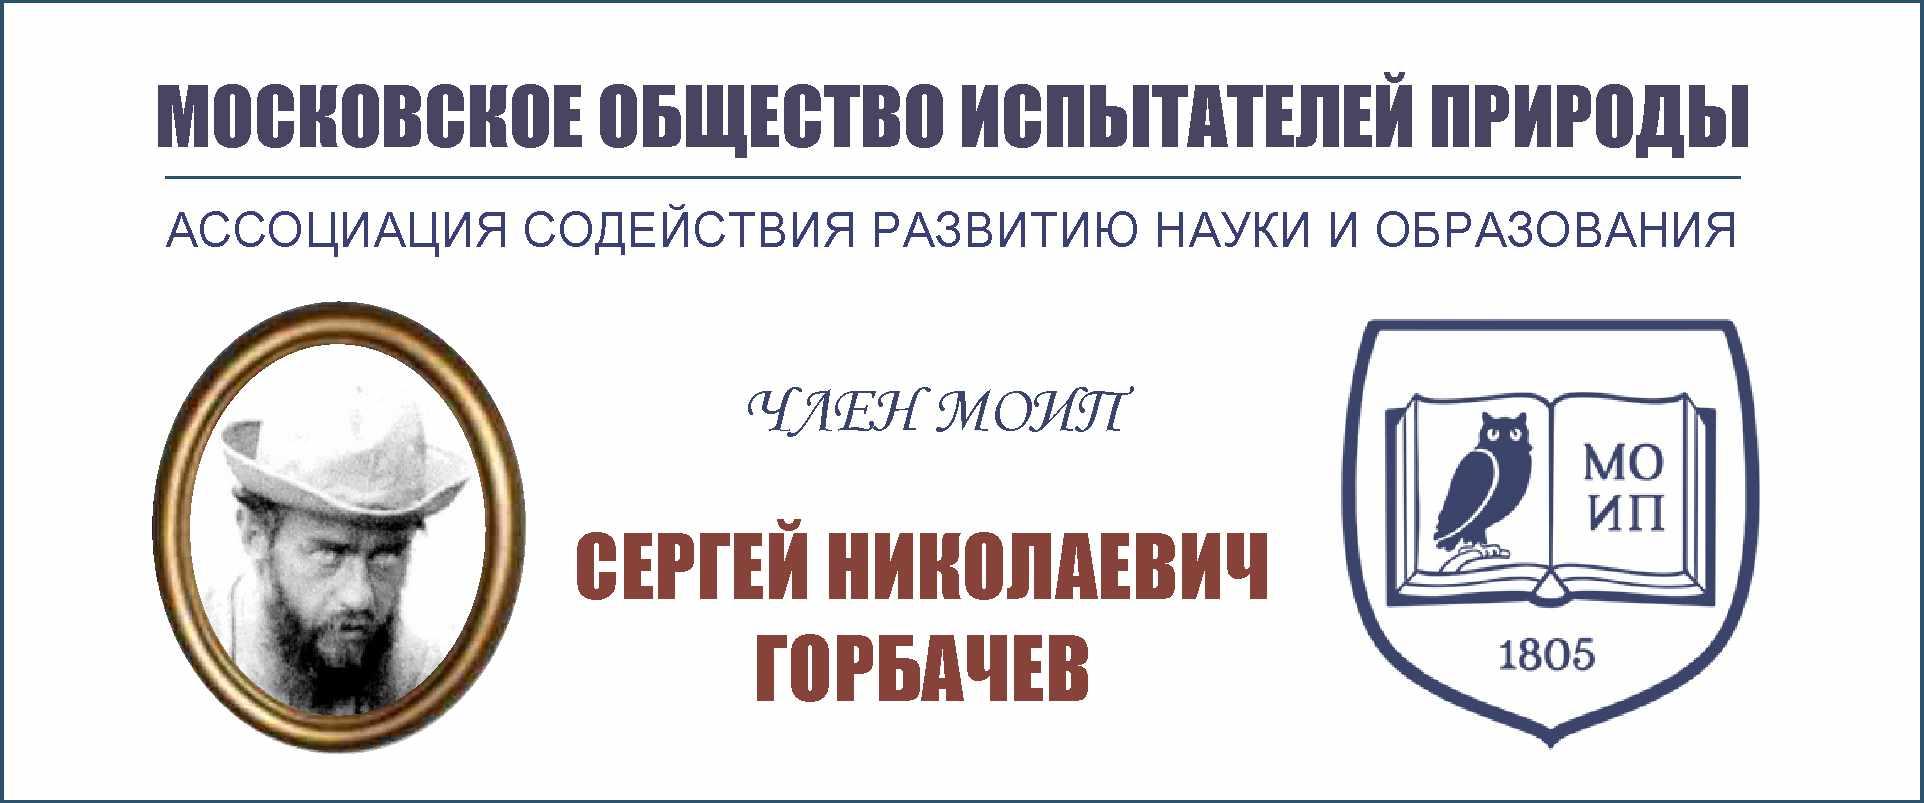 Сергей Николаевич Горбачёв — врач, зоолог, краевед